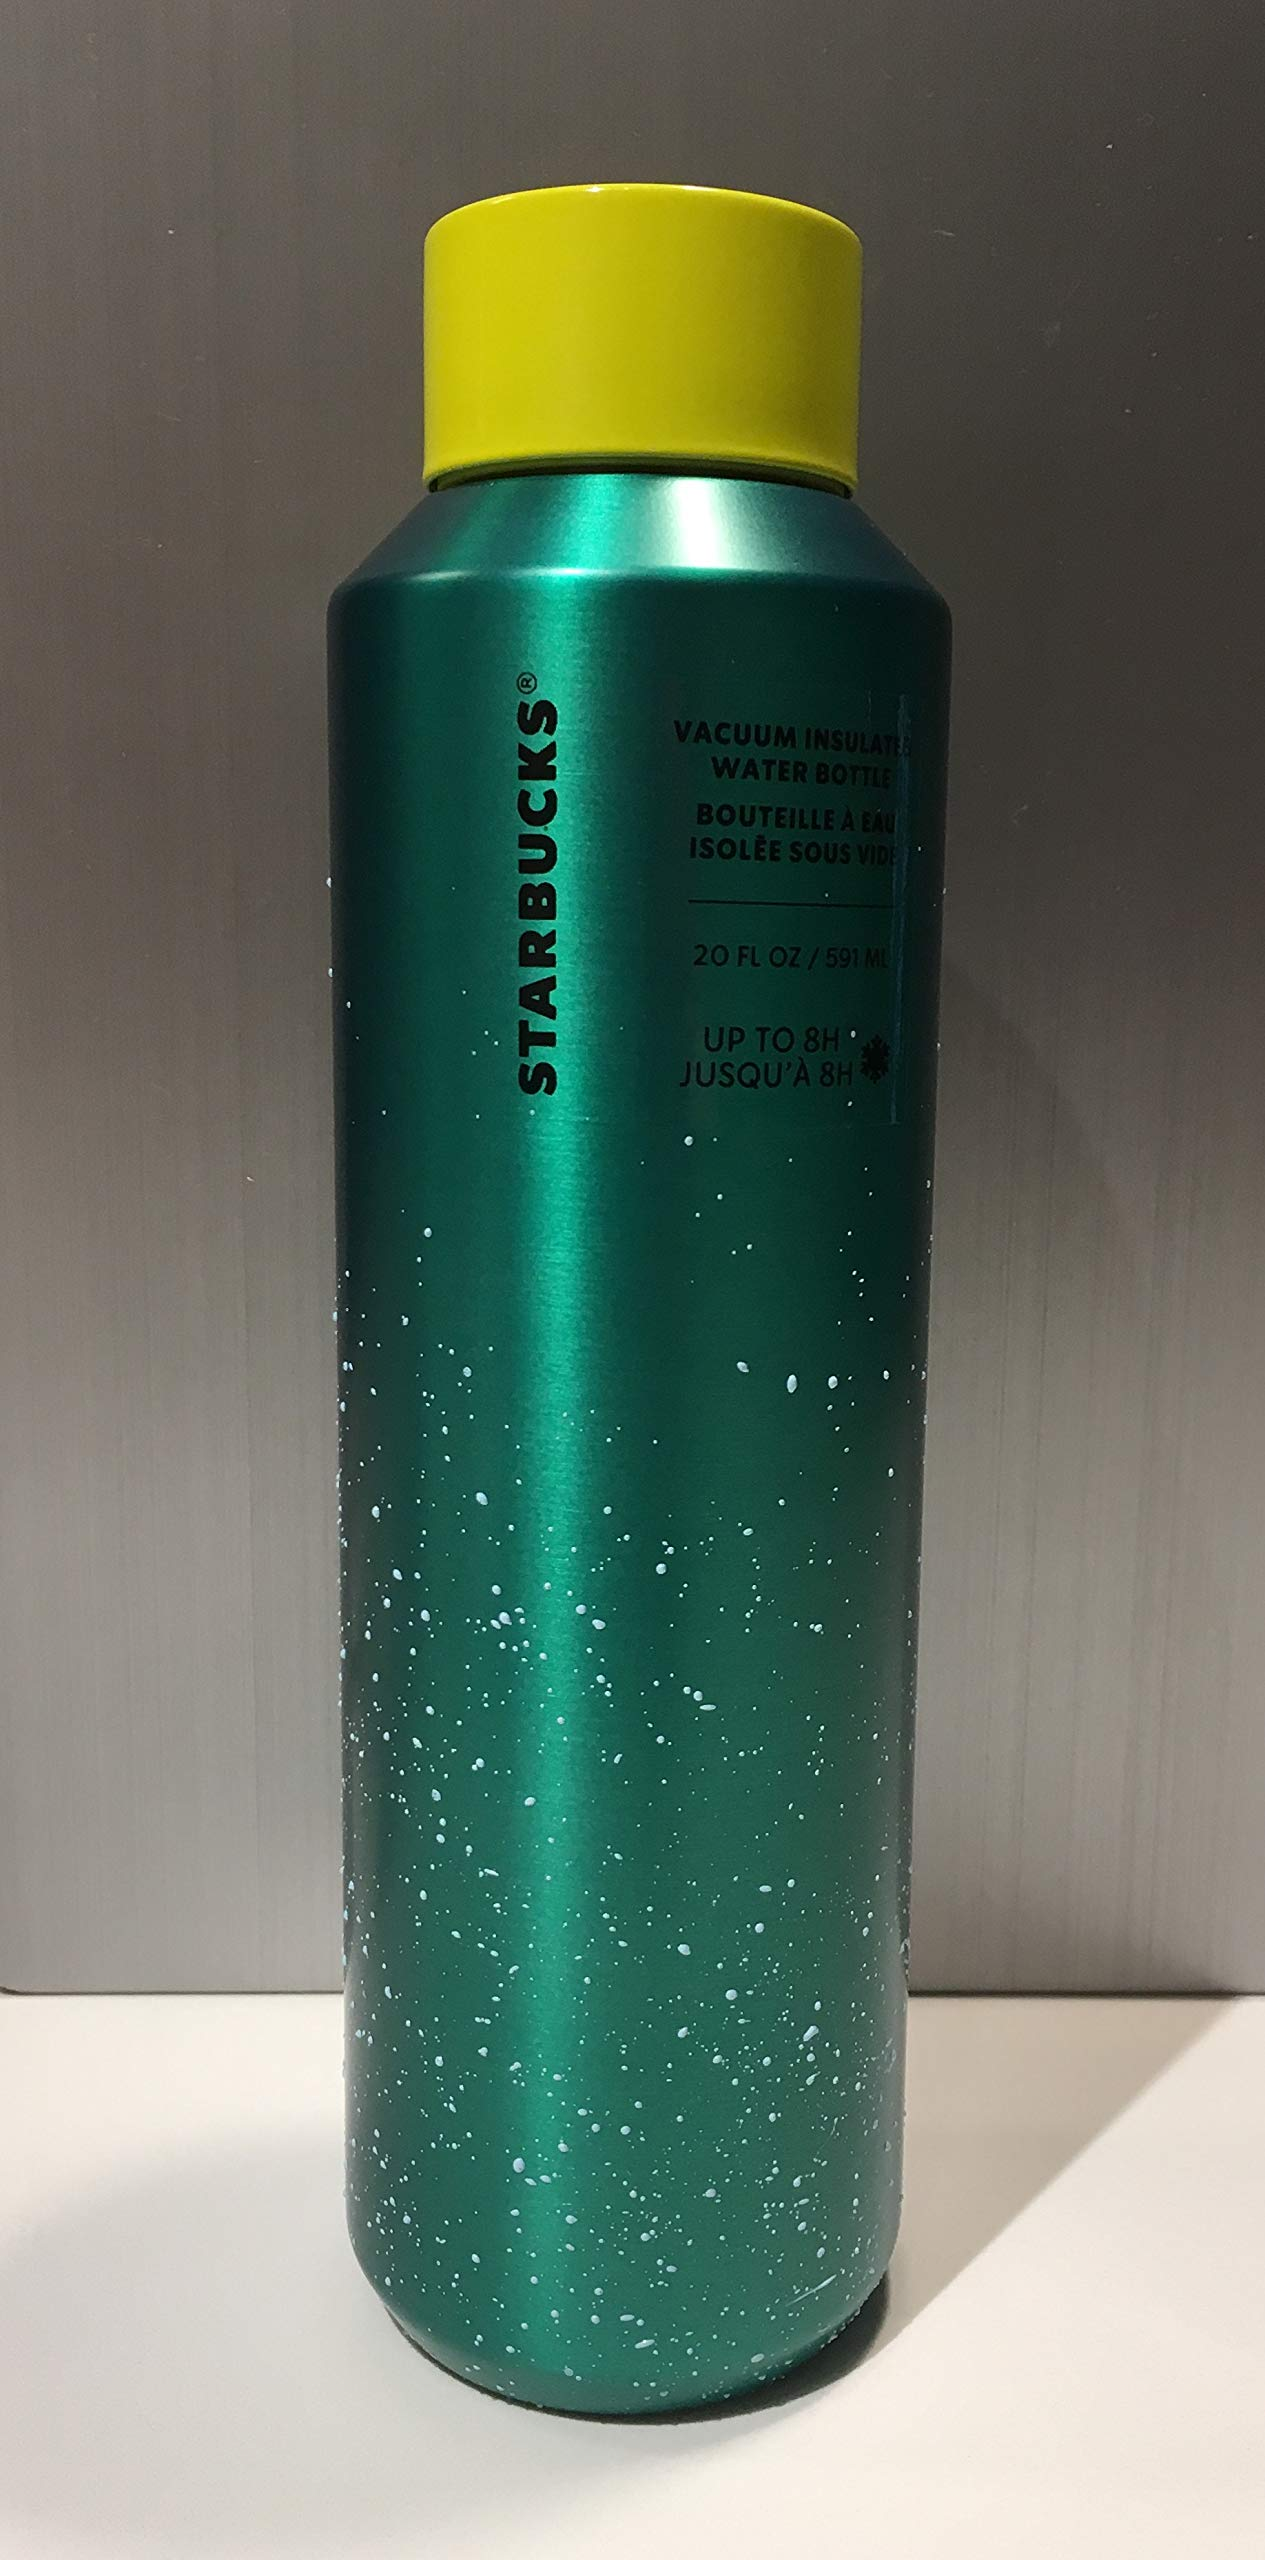 Starbucks Green Vacuum Insulated Water Bottle 20 oz